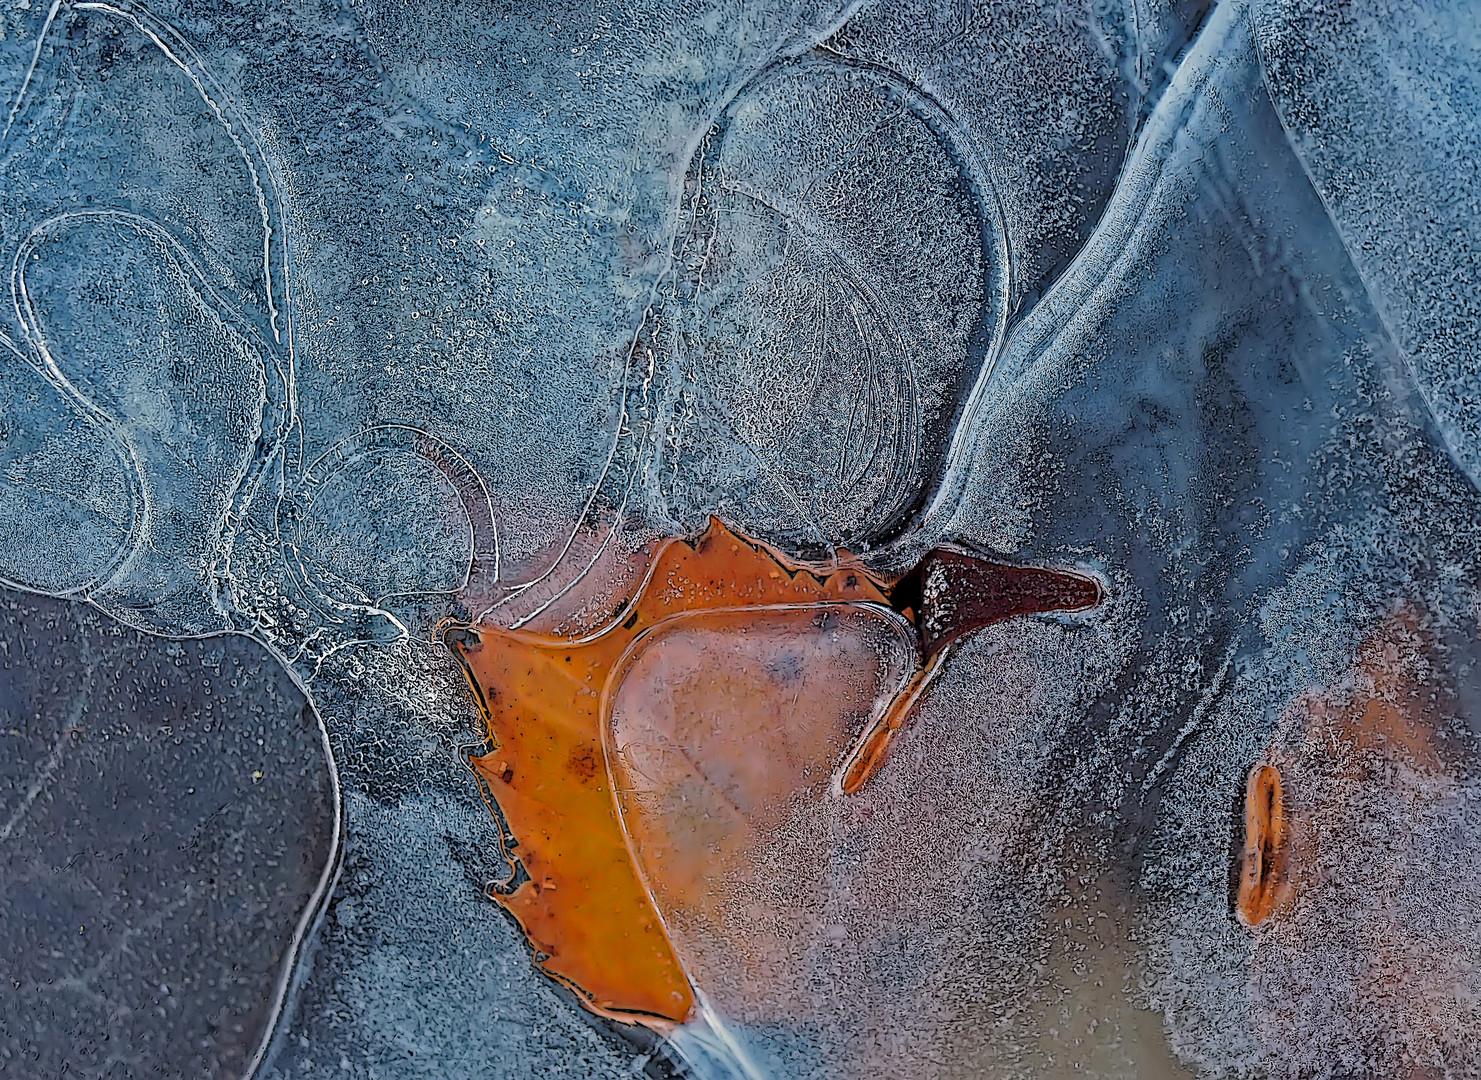 Herbst und Winter umarmen sich... - Quand l'automne et l'hiver s'embrassent!